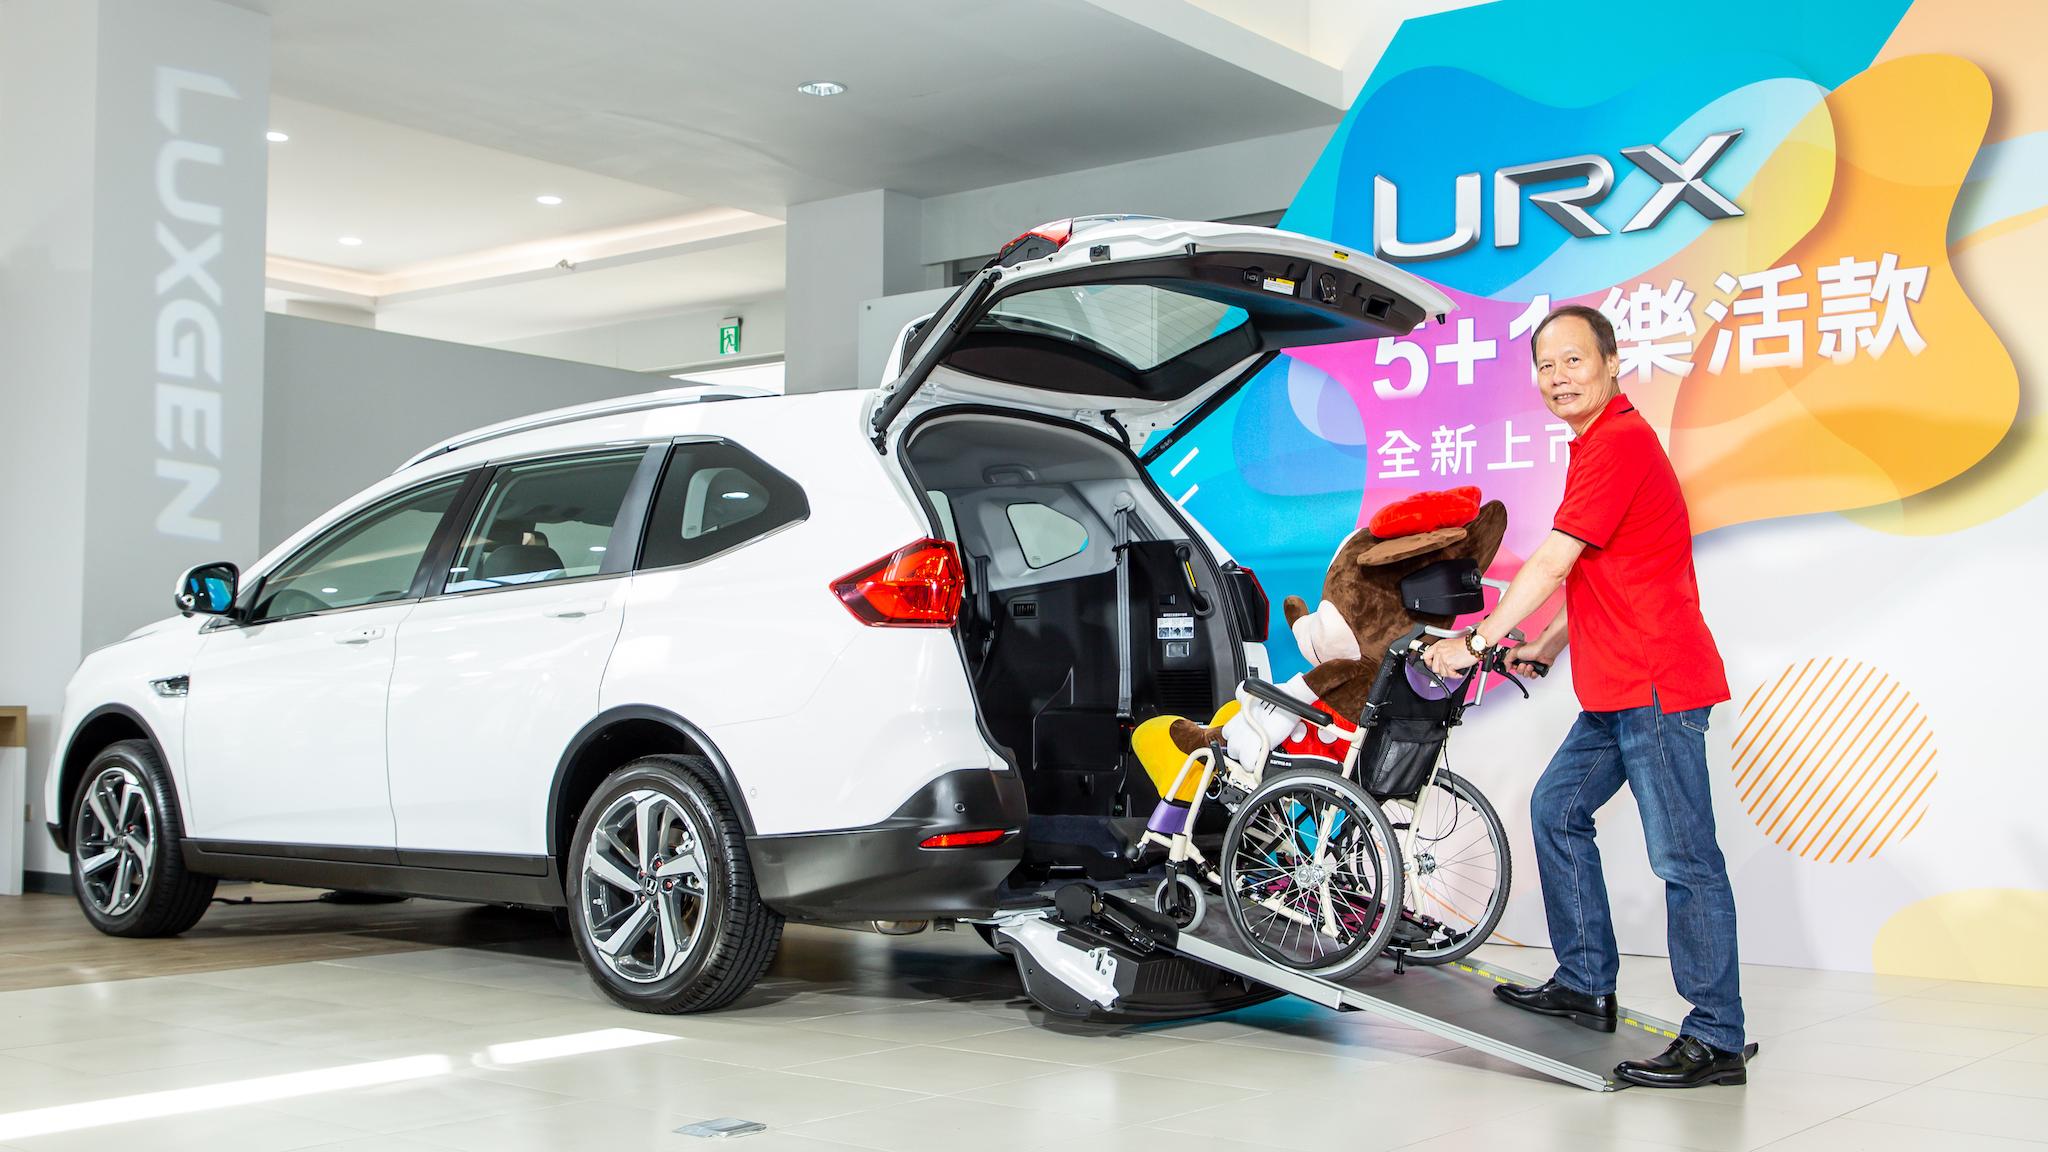 Luxgen URX 5+1 樂活款輪椅快扣裝置獲 2020 iF 設計大獎